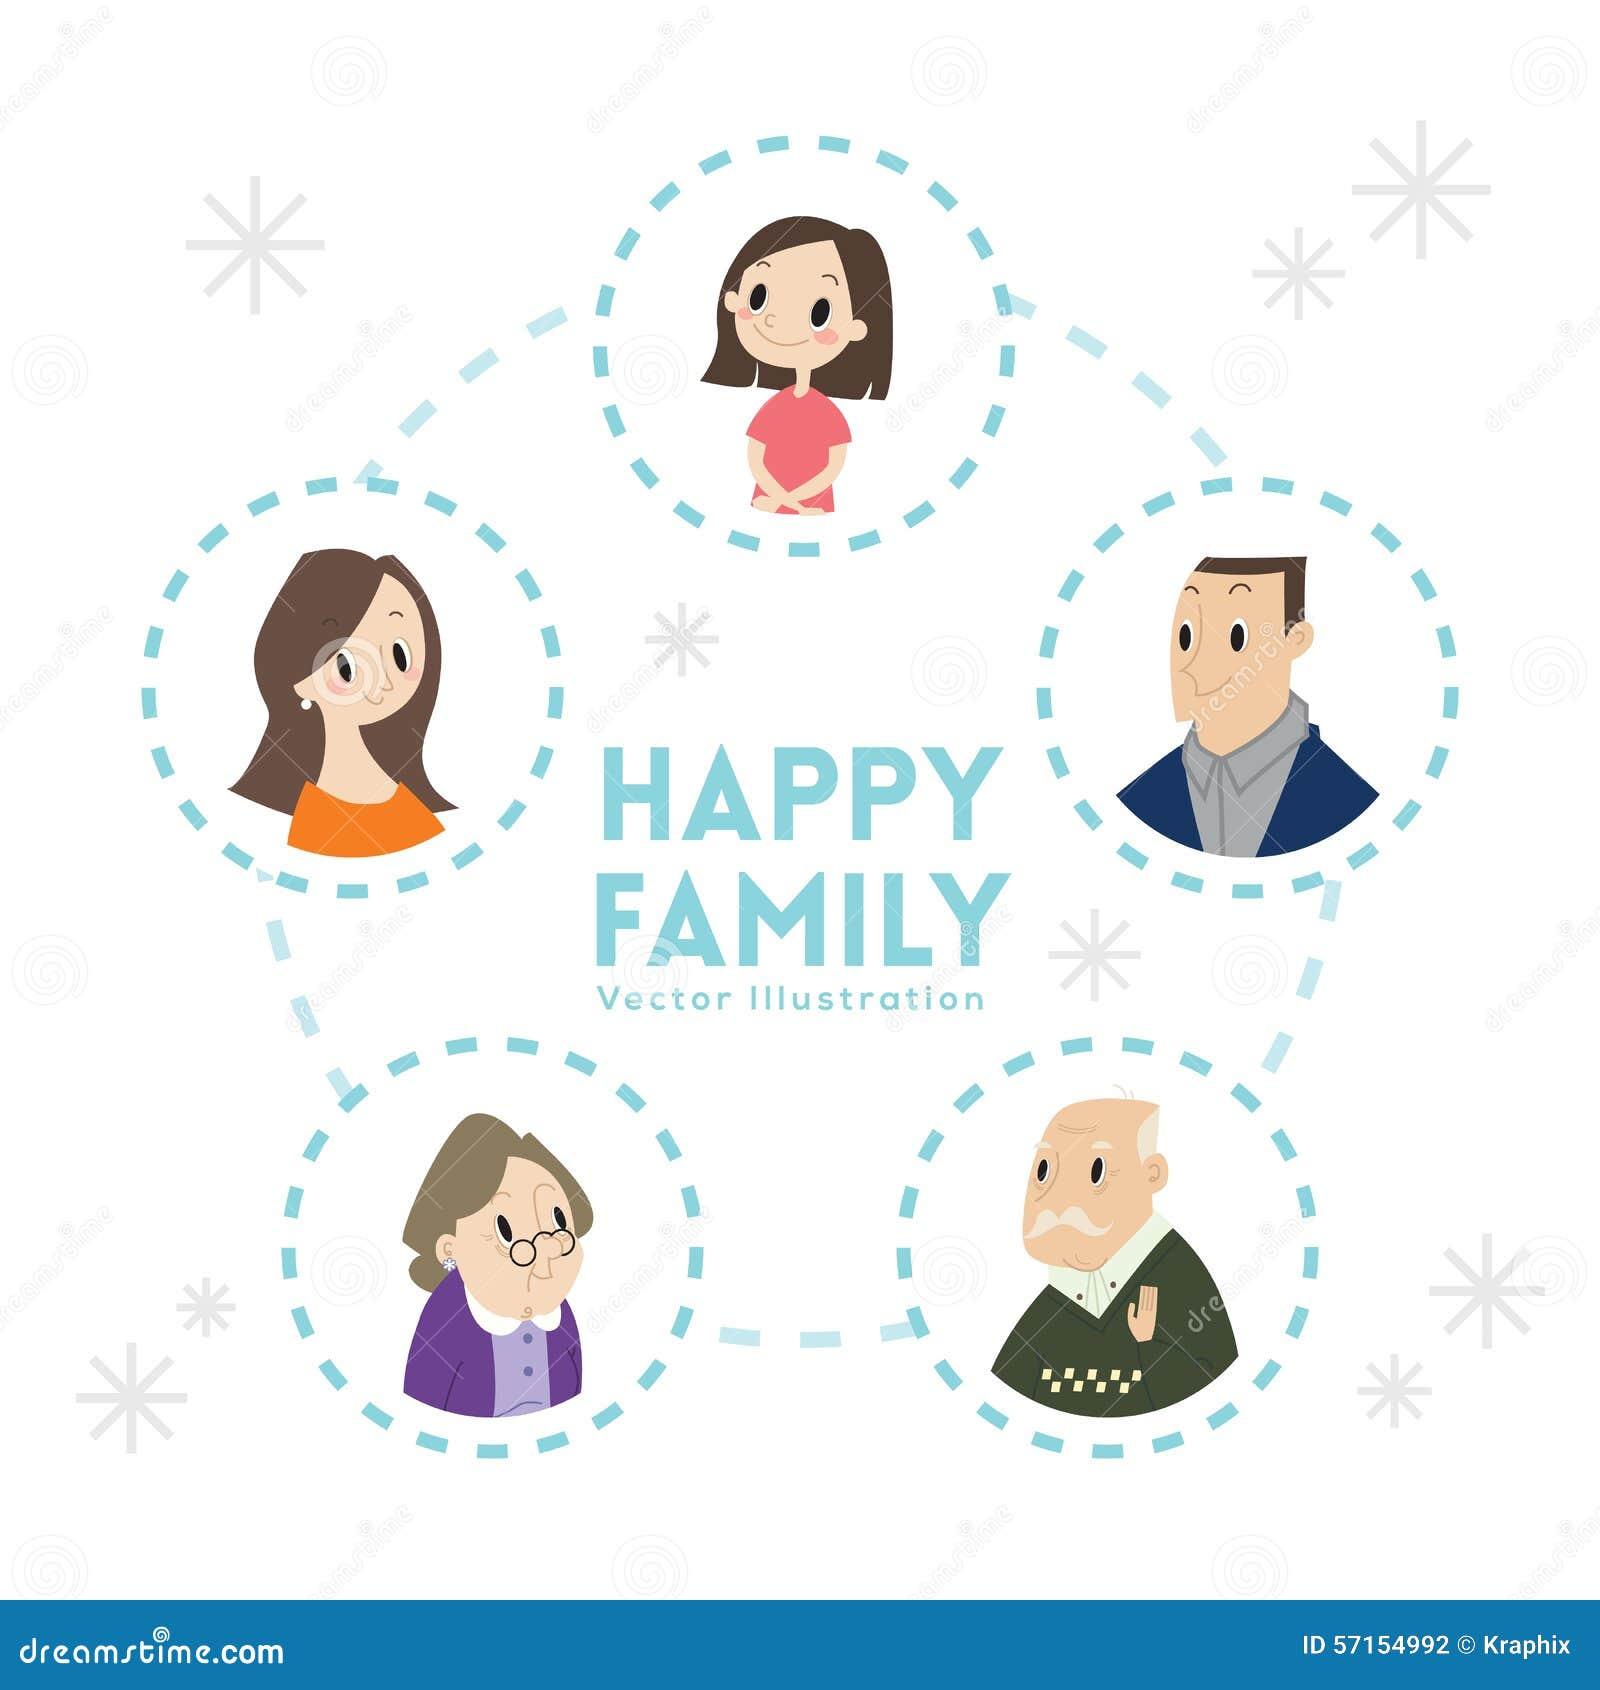 Big Happy Family Portrait Cartoon Illustration Stock Vector - Image ...